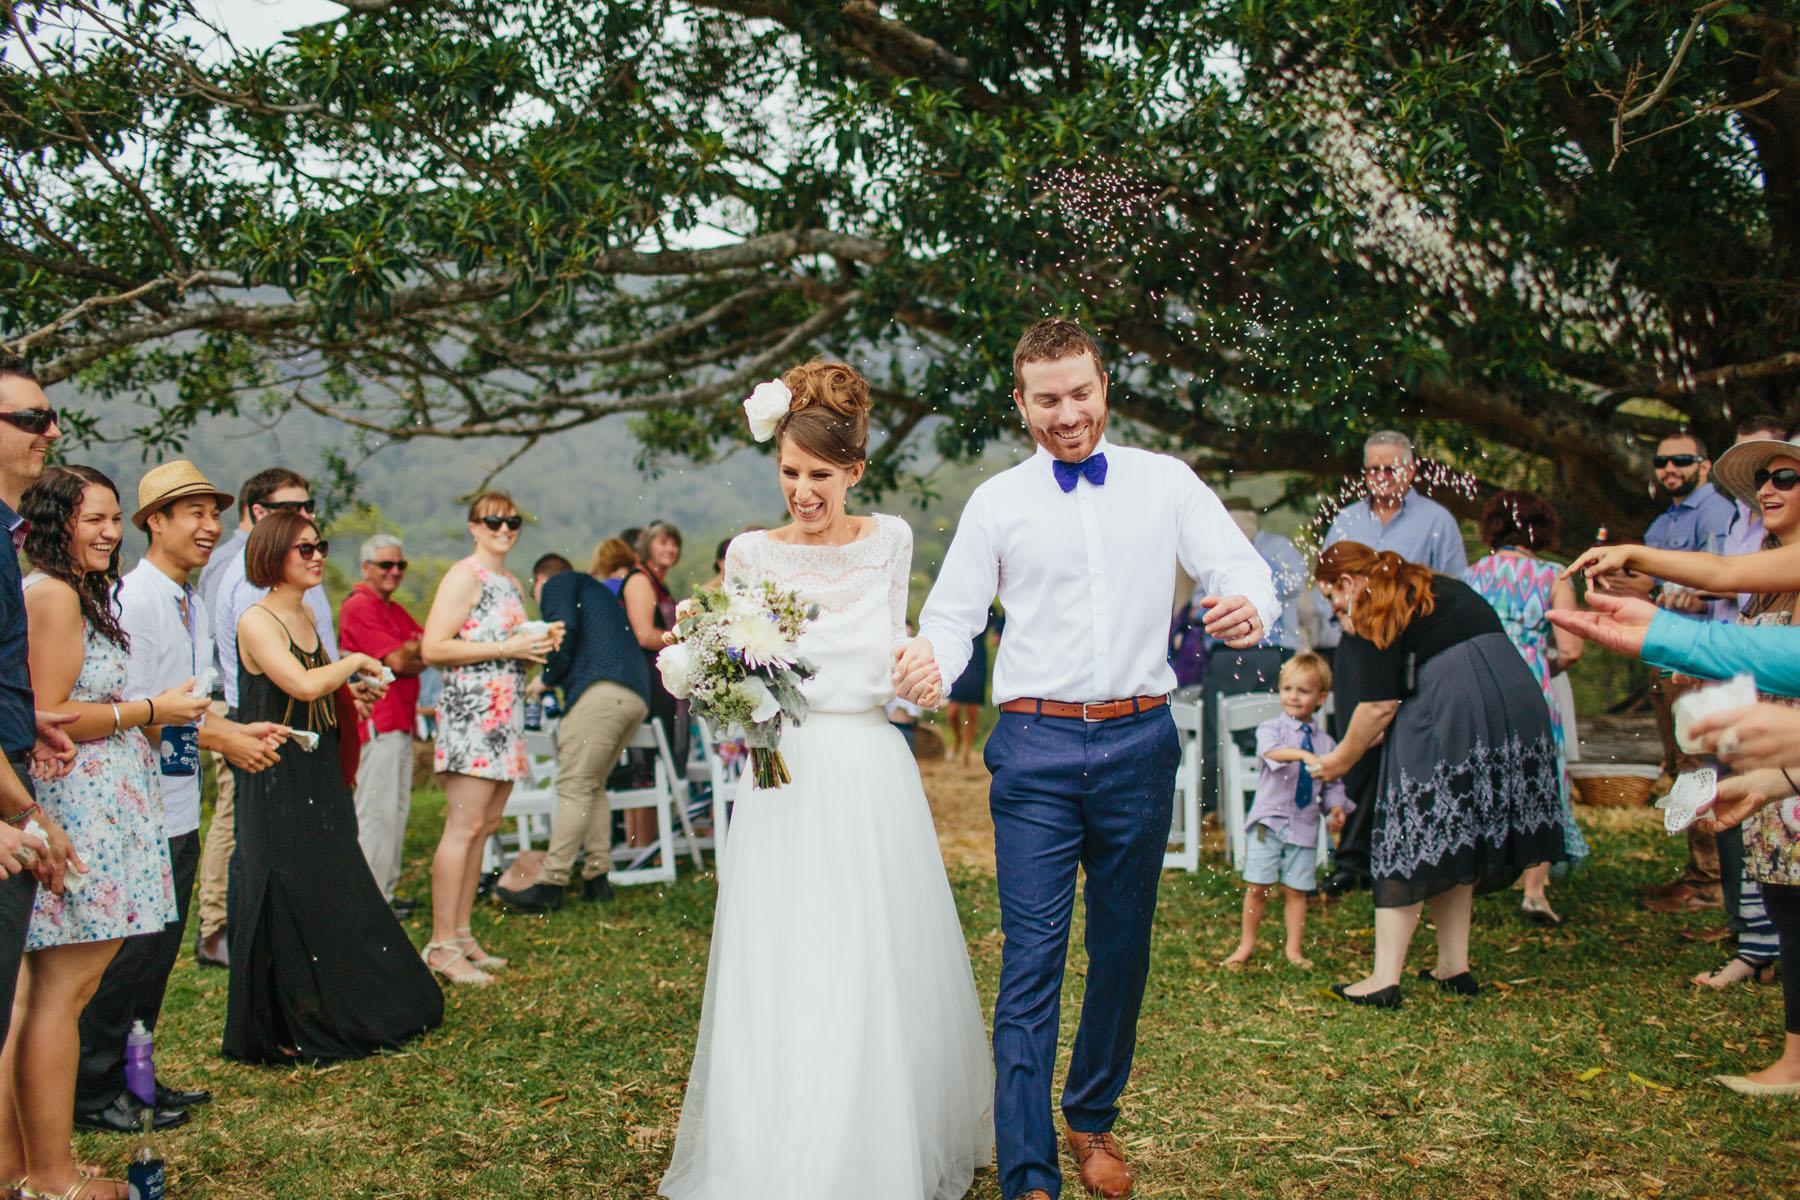 12_midginbill hill wedding .jpg